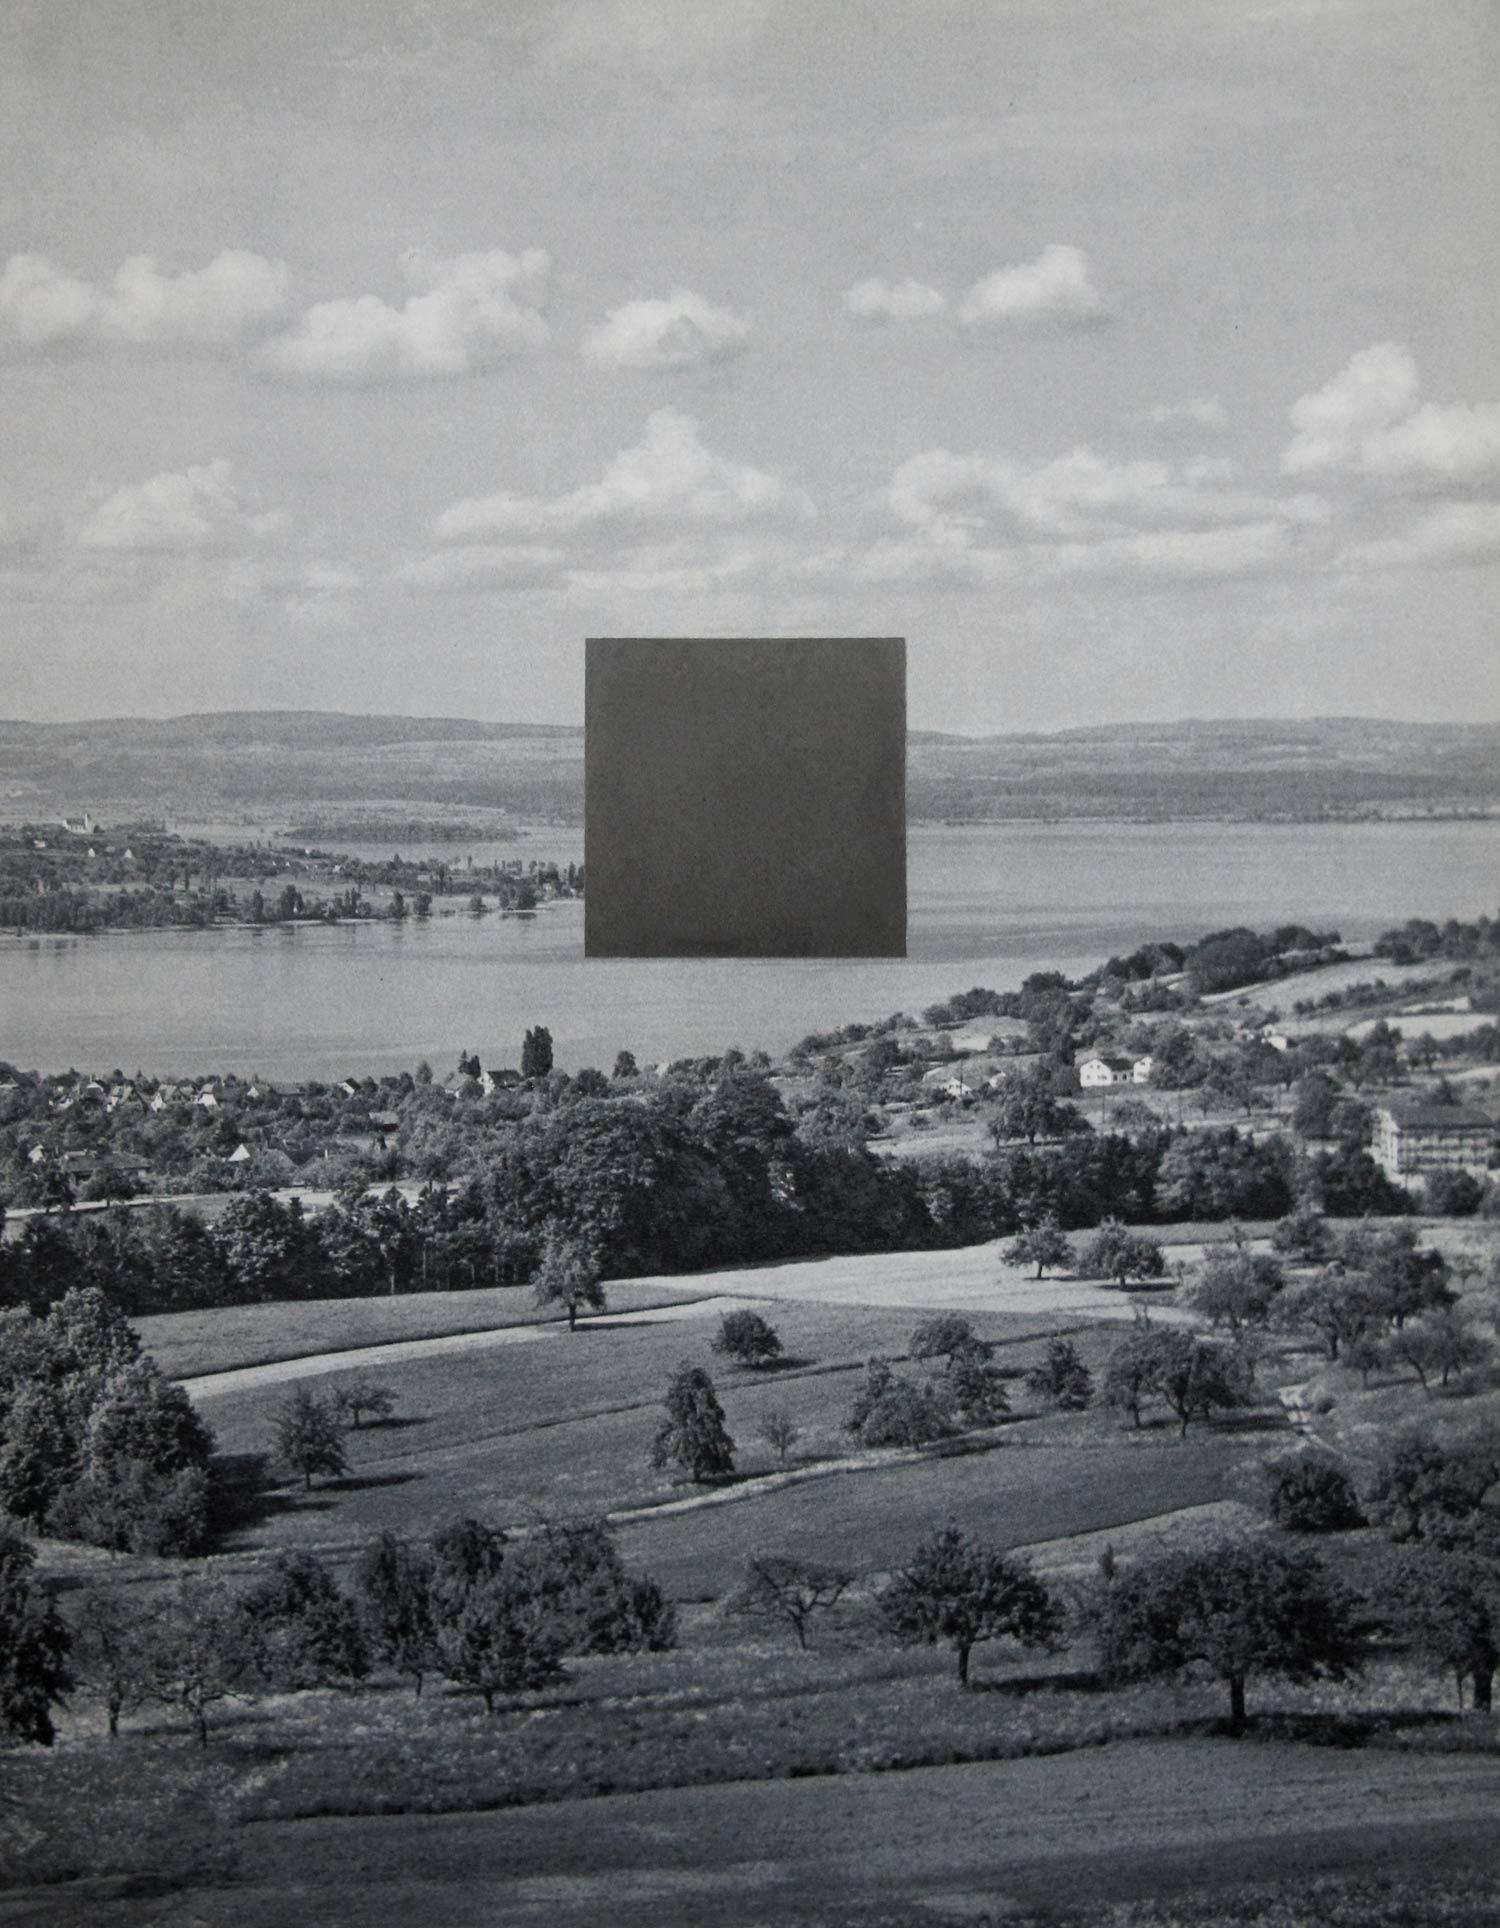 Construction time again: Lake block (2016) - Fernando Martín Godoy